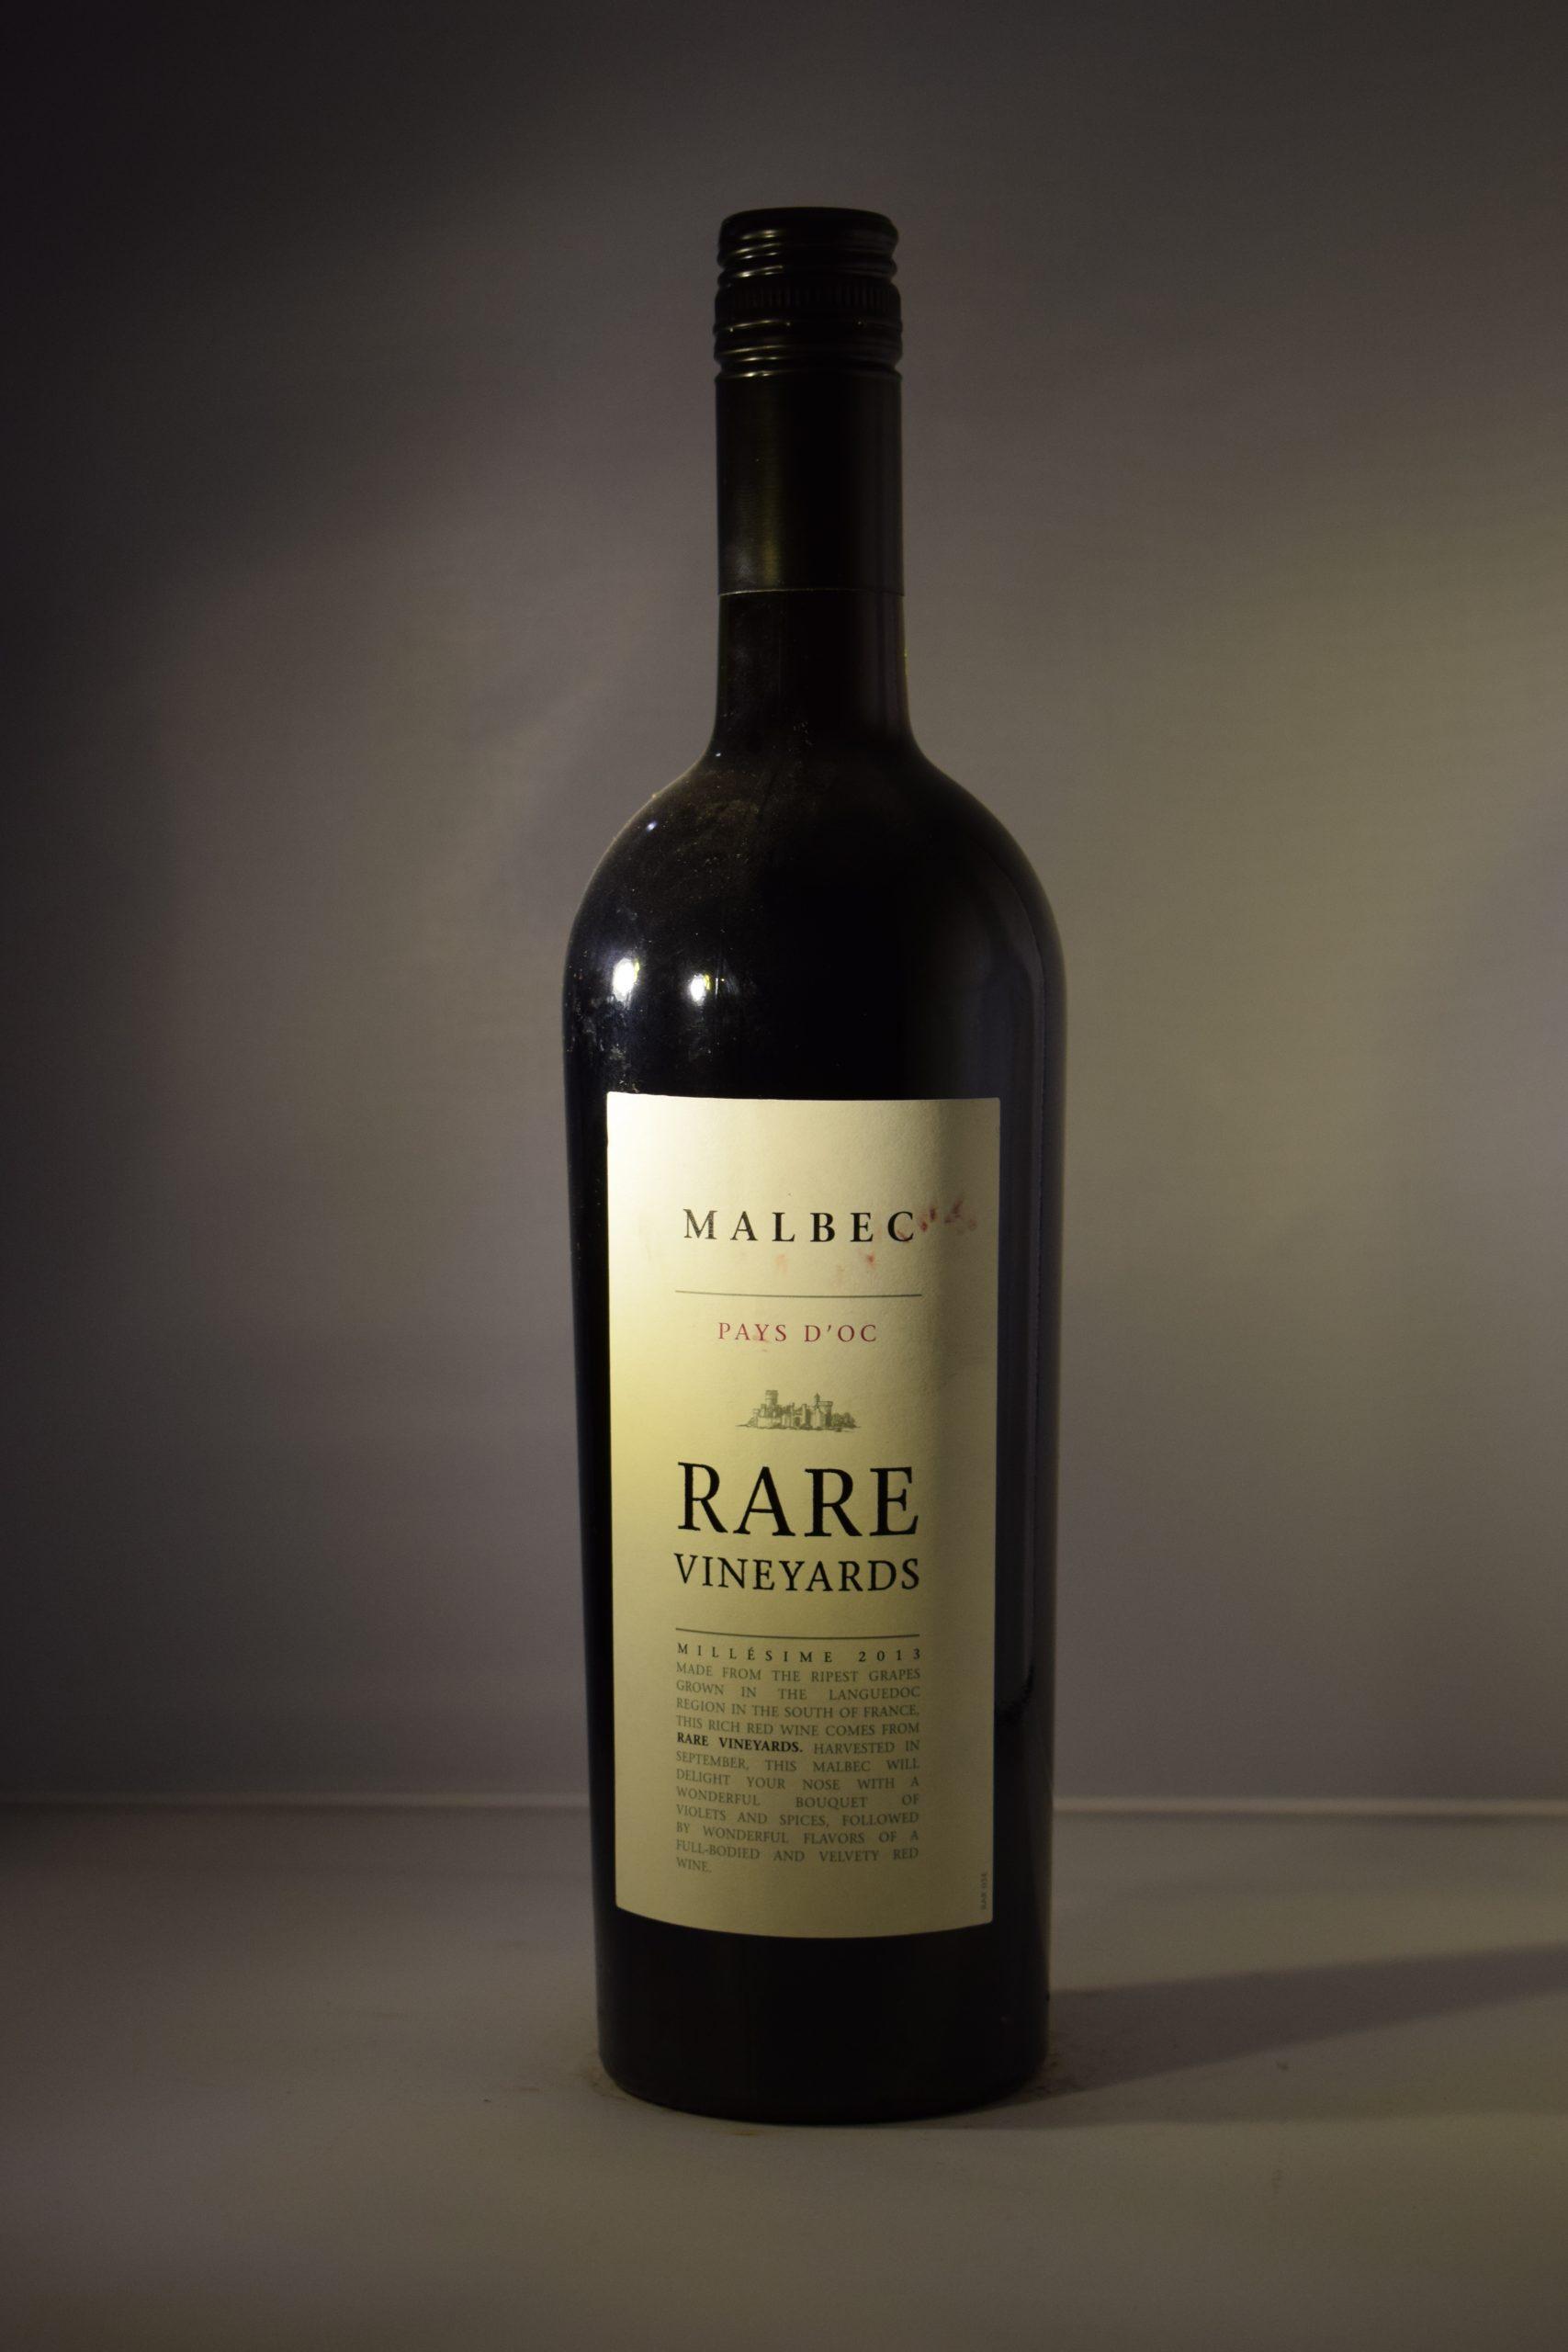 Rare Vineyards Pays D'oc Malbec 2013